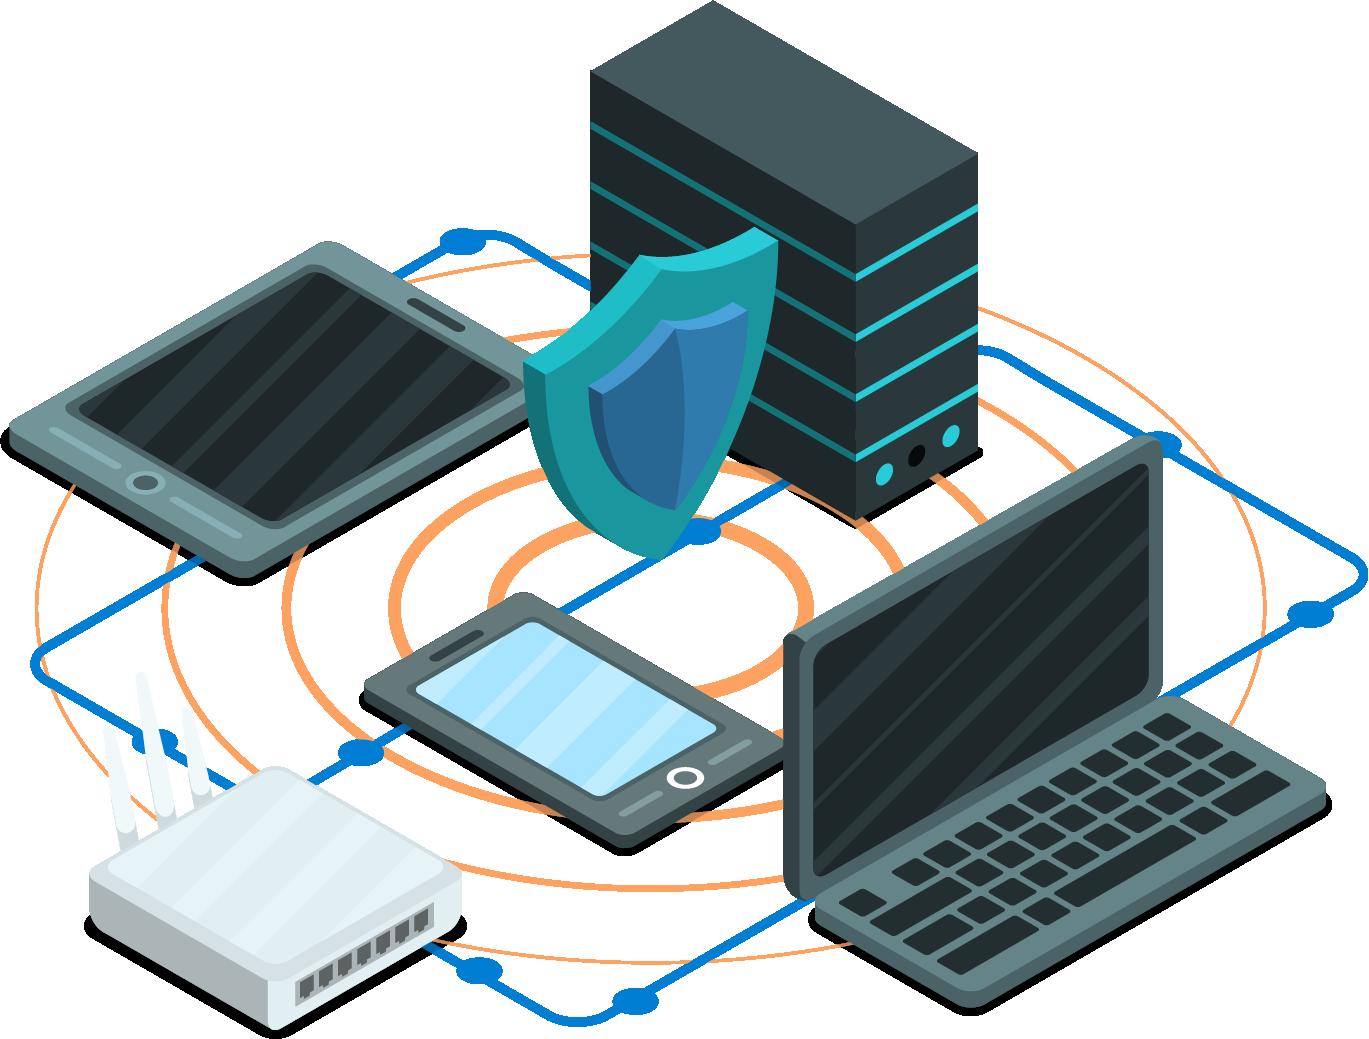 Proveedor de servicios networking e infraestructura de redes Medellín